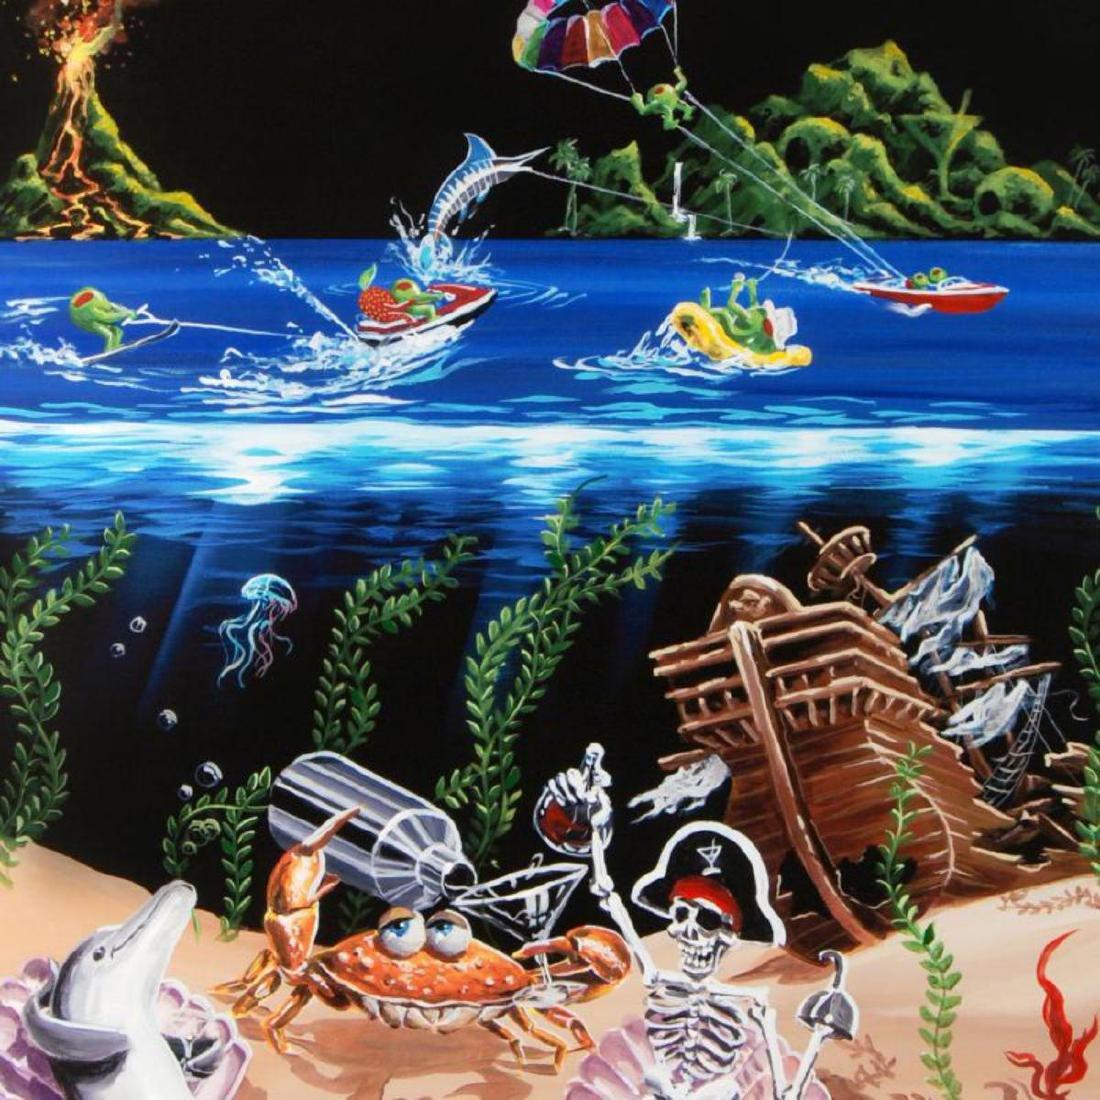 """Sand Bar 2"" Mural LIMITED EDITION Hand-Embellished - 2"